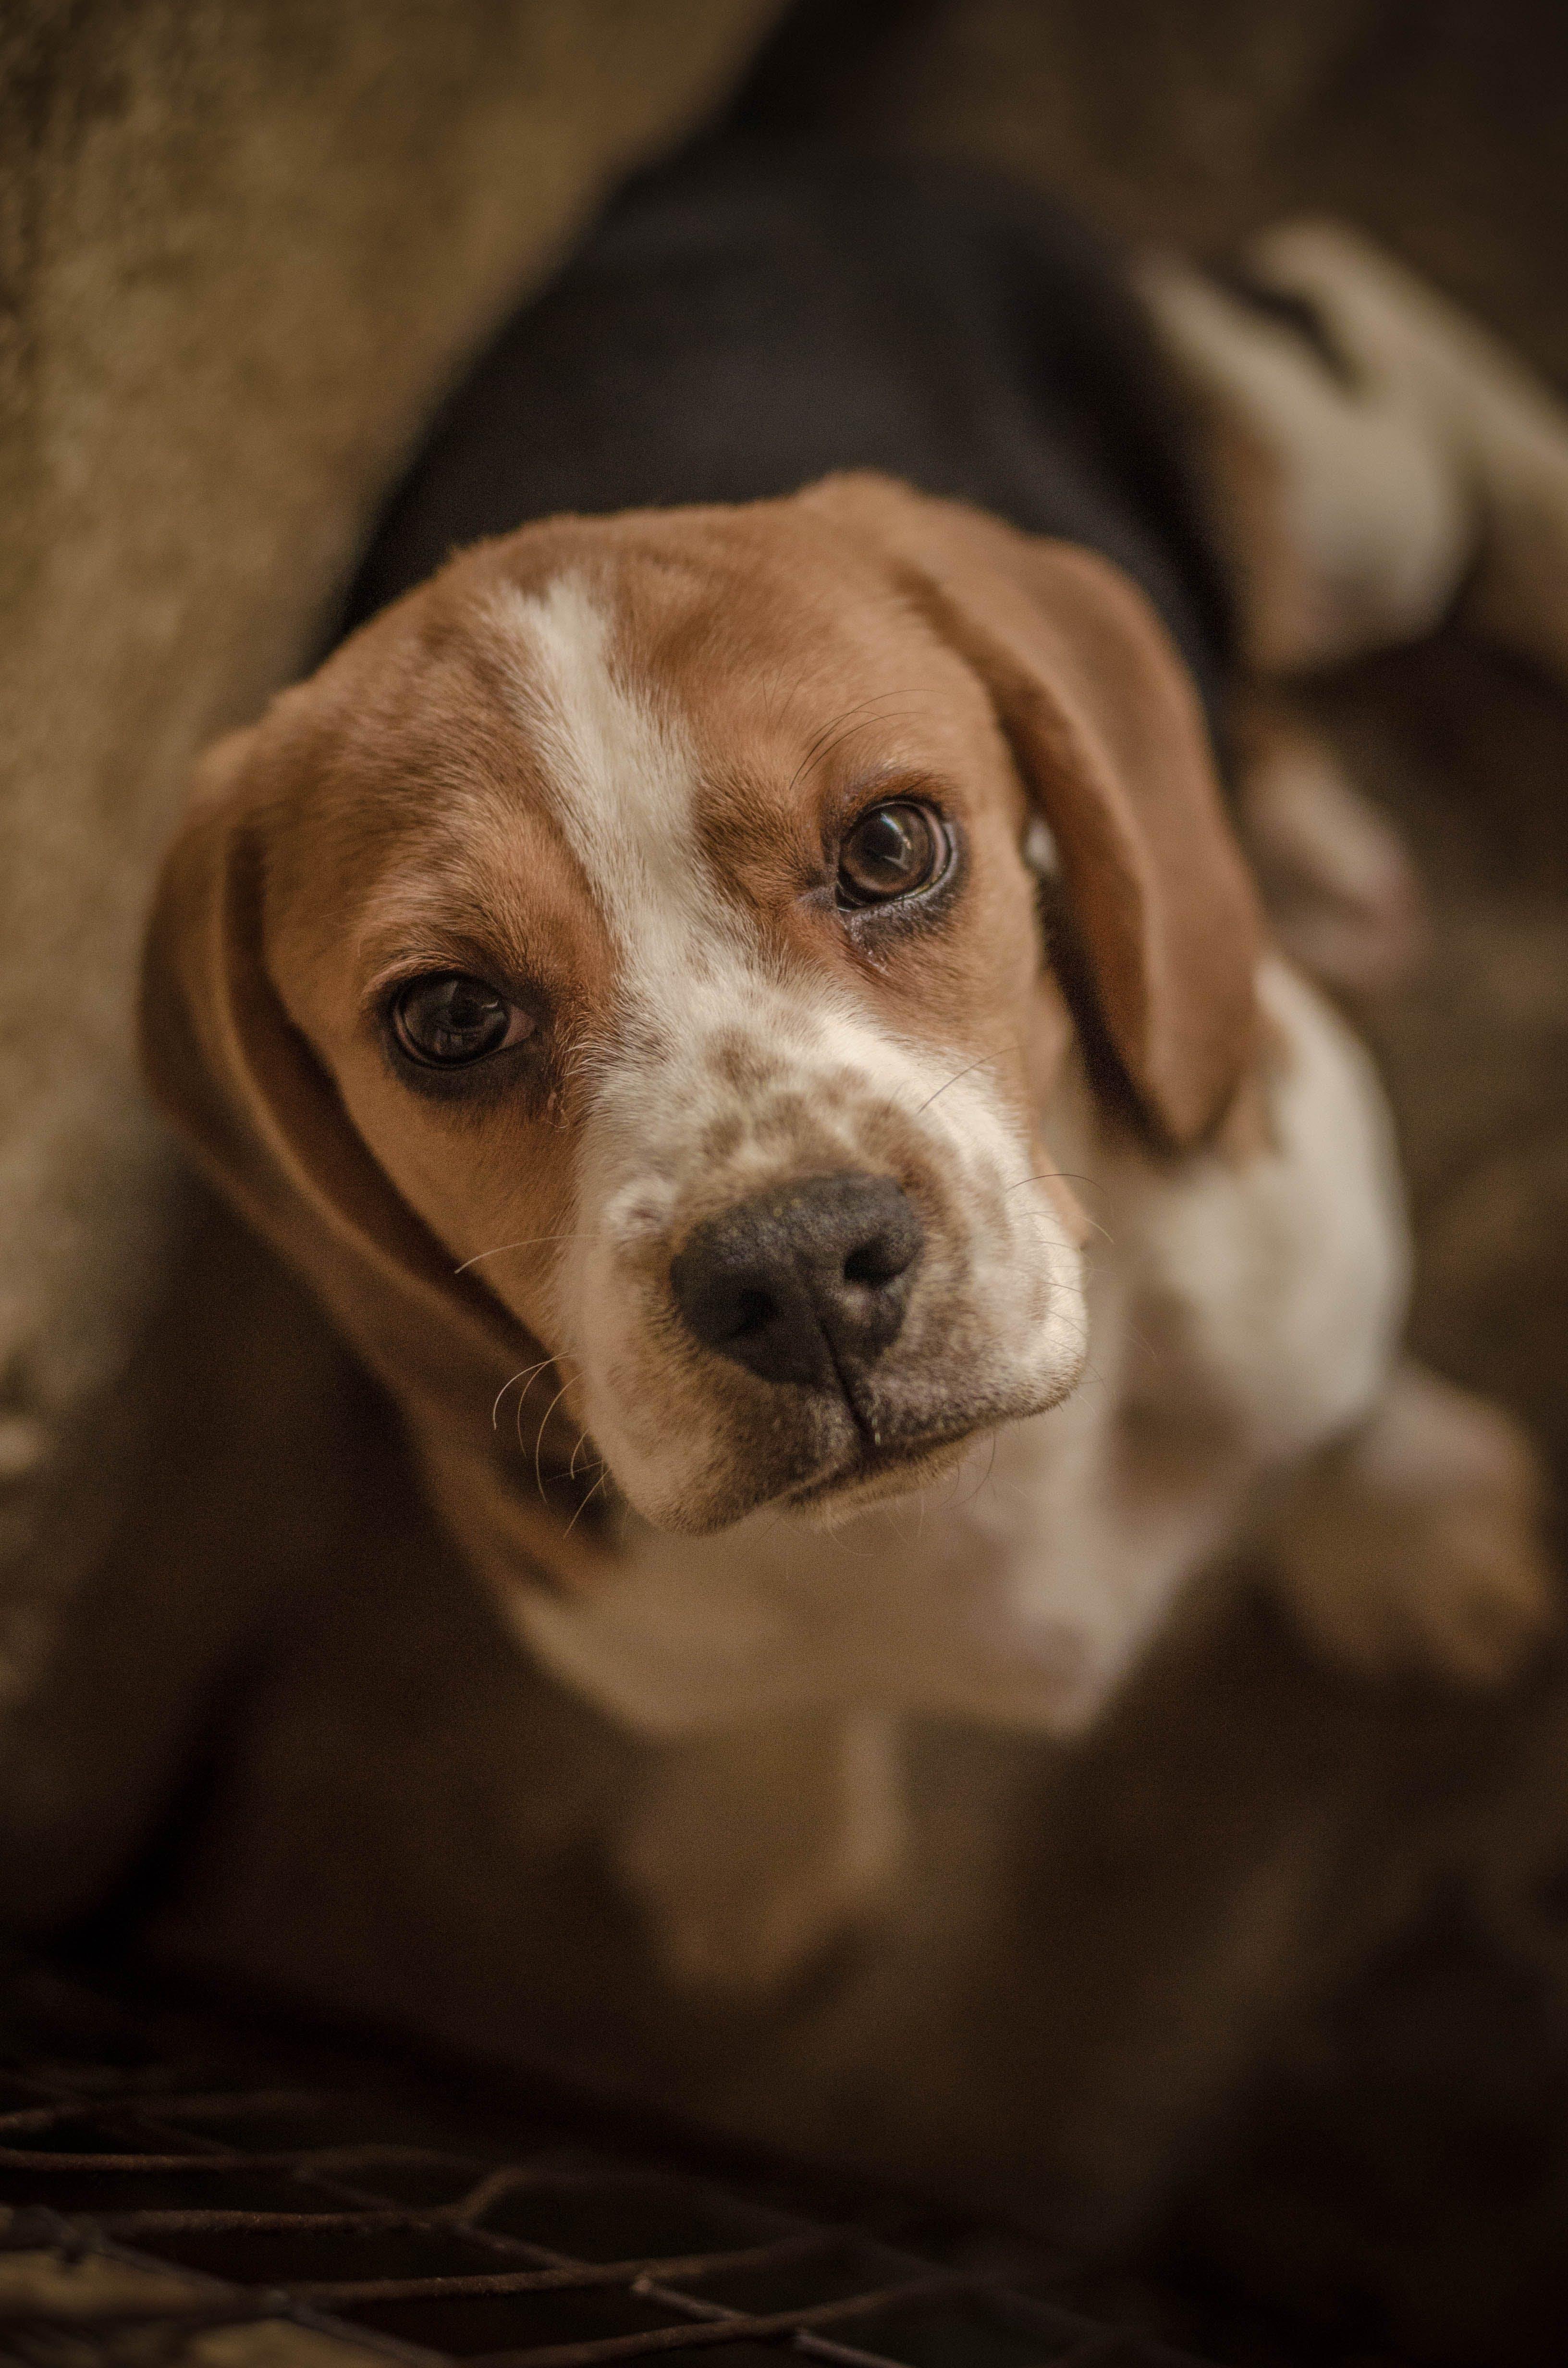 Free stock photo of animal, beagle, cute, dog